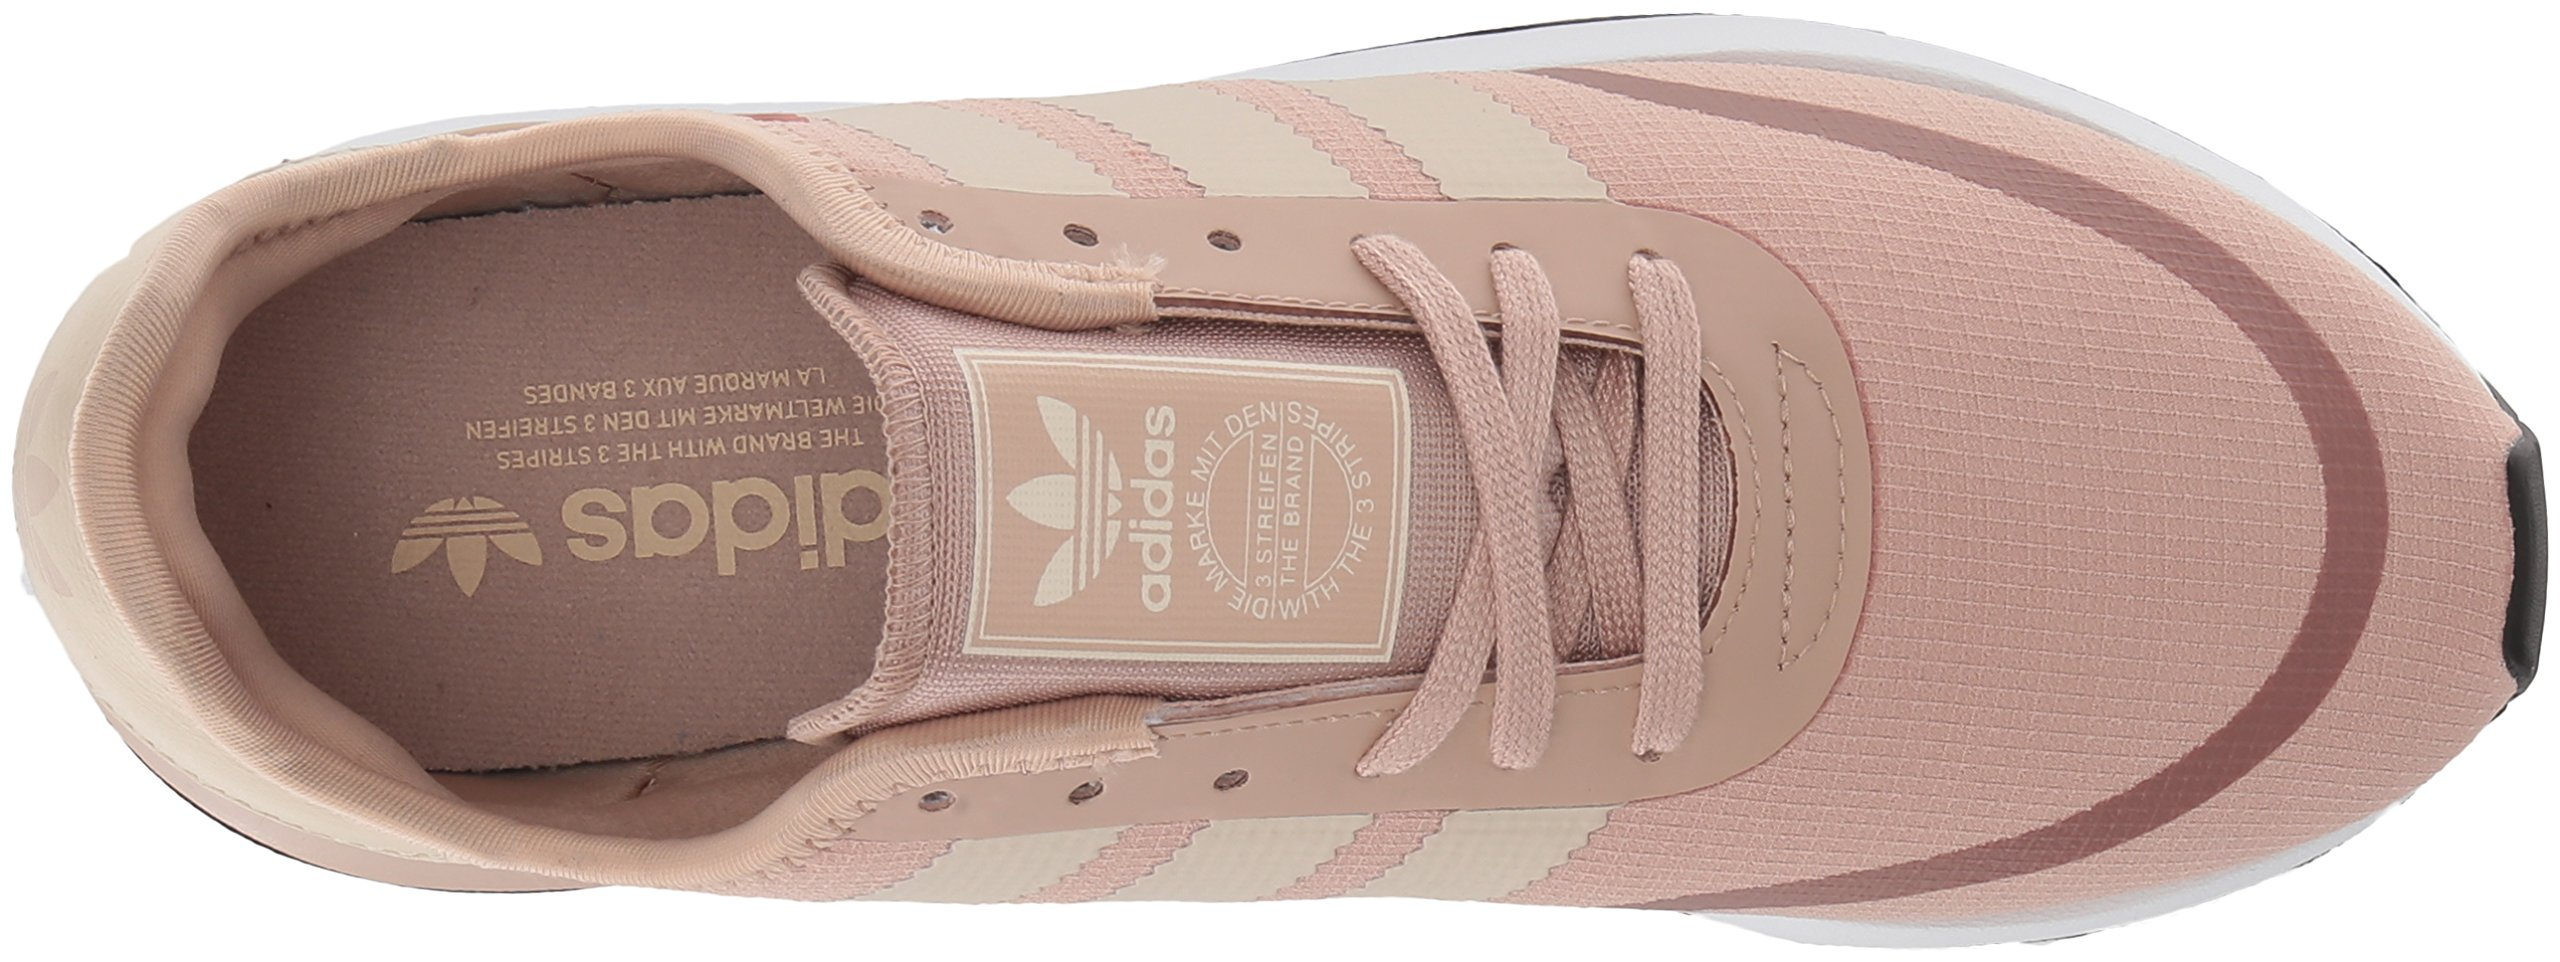 adidas Originals Women's Iniki Runner CLS W, Ash Pearl/Linen/White, 5 M US by adidas Originals (Image #7)